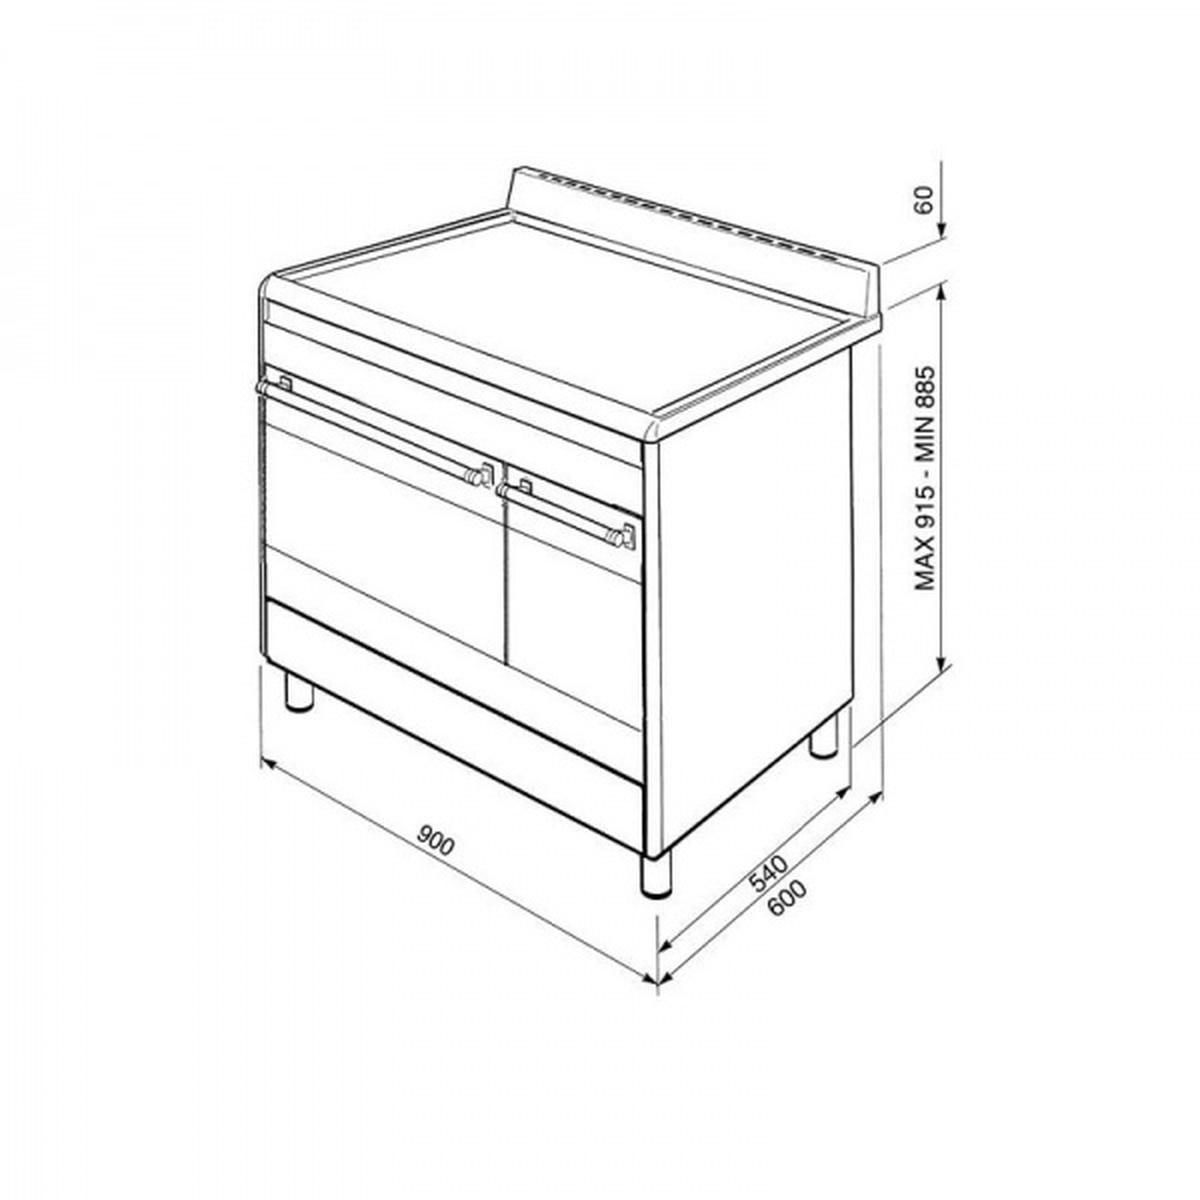 Smeg Classic komfyr 2 ovner rustfritt stål SCB92MX8